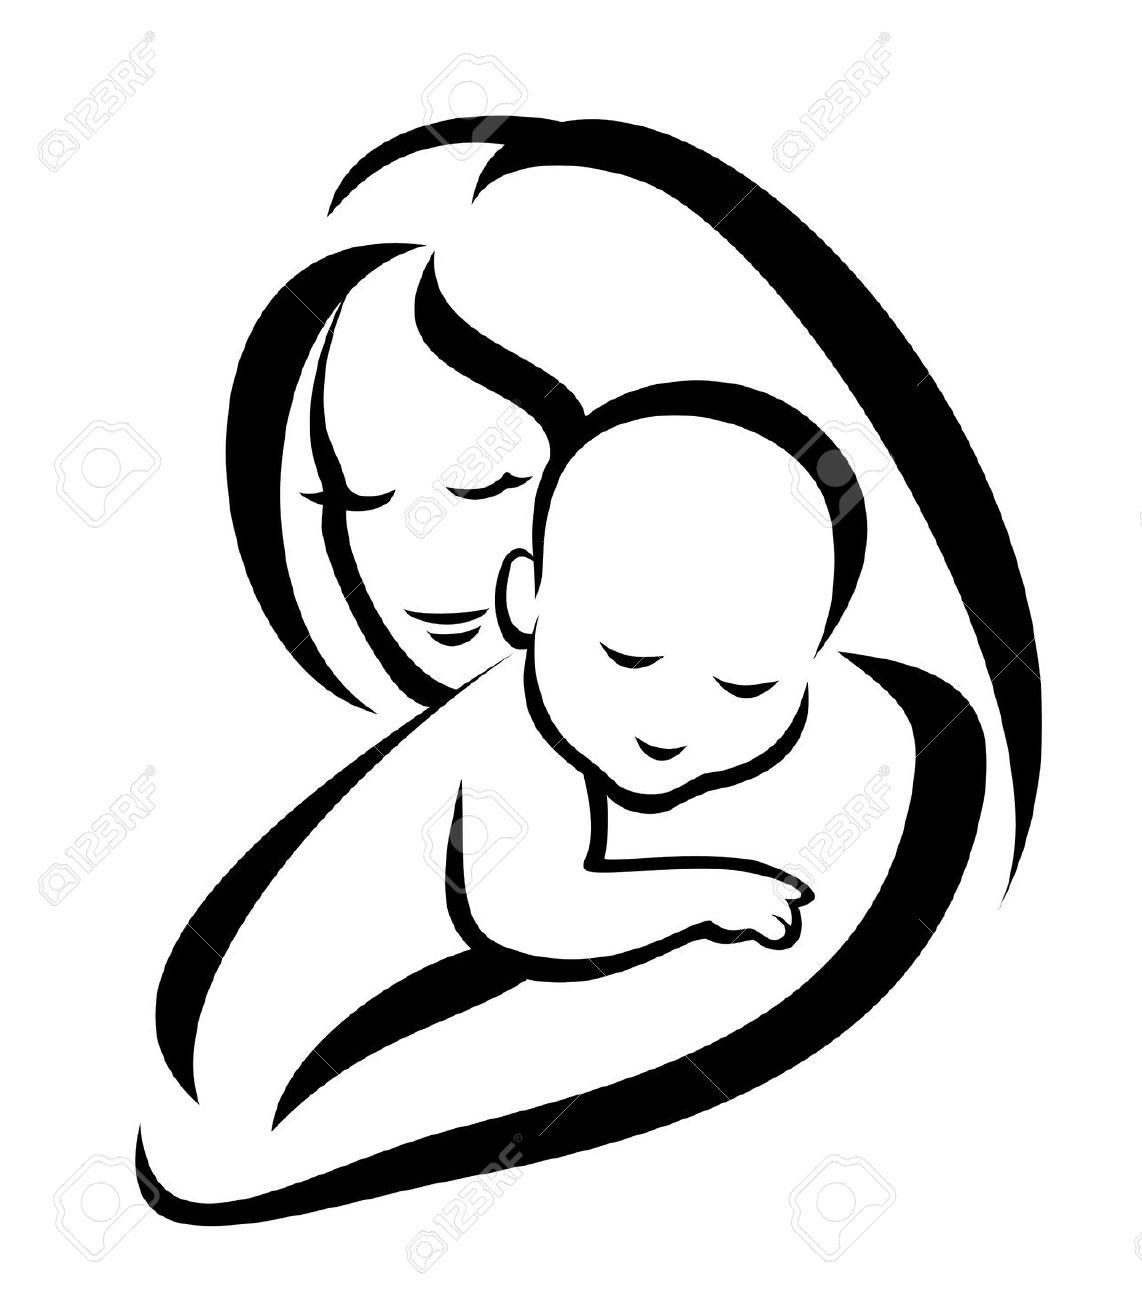 Mother and free download. Hug clipart hug baby